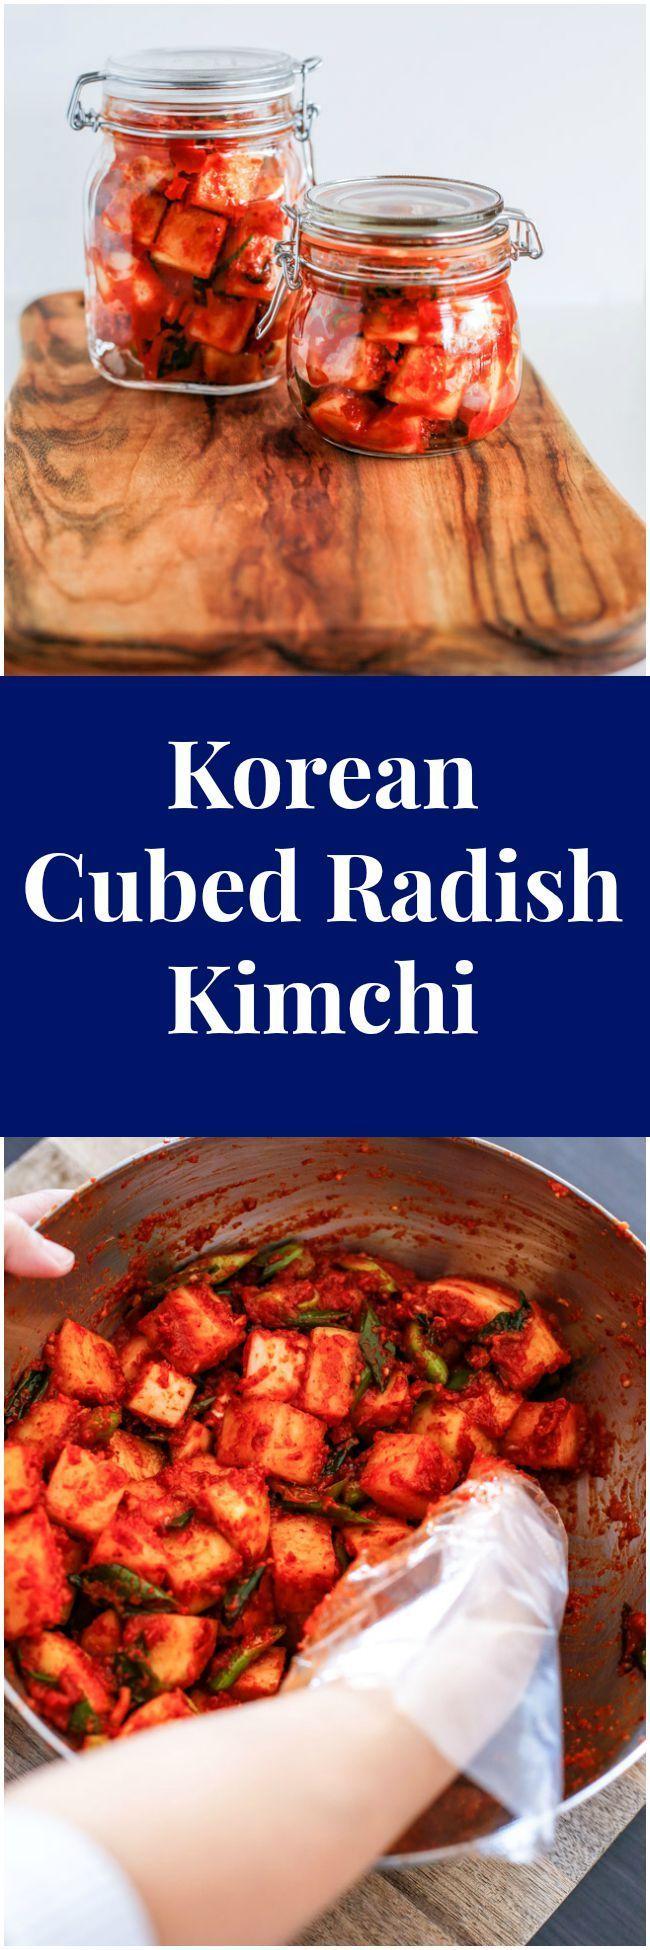 How to make authentic Korean cubed radish Kimchi (KKakdugi)   MyKoreanKitchen.com